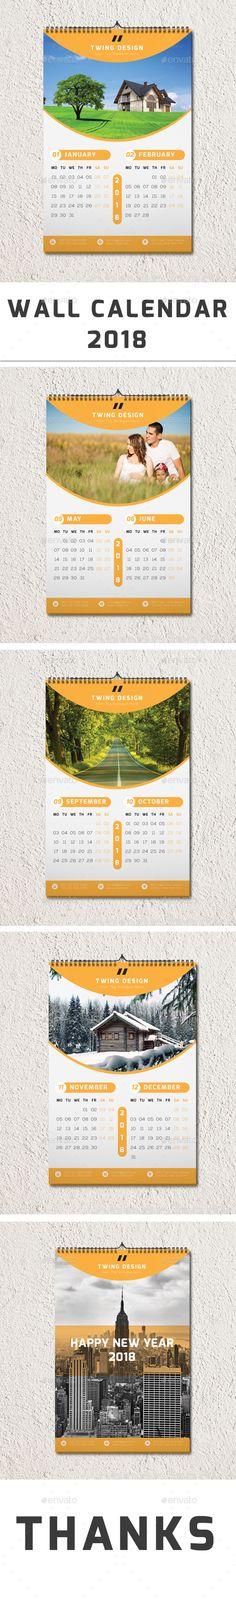 Wall Calendar 2018 - Calendars #Stationery